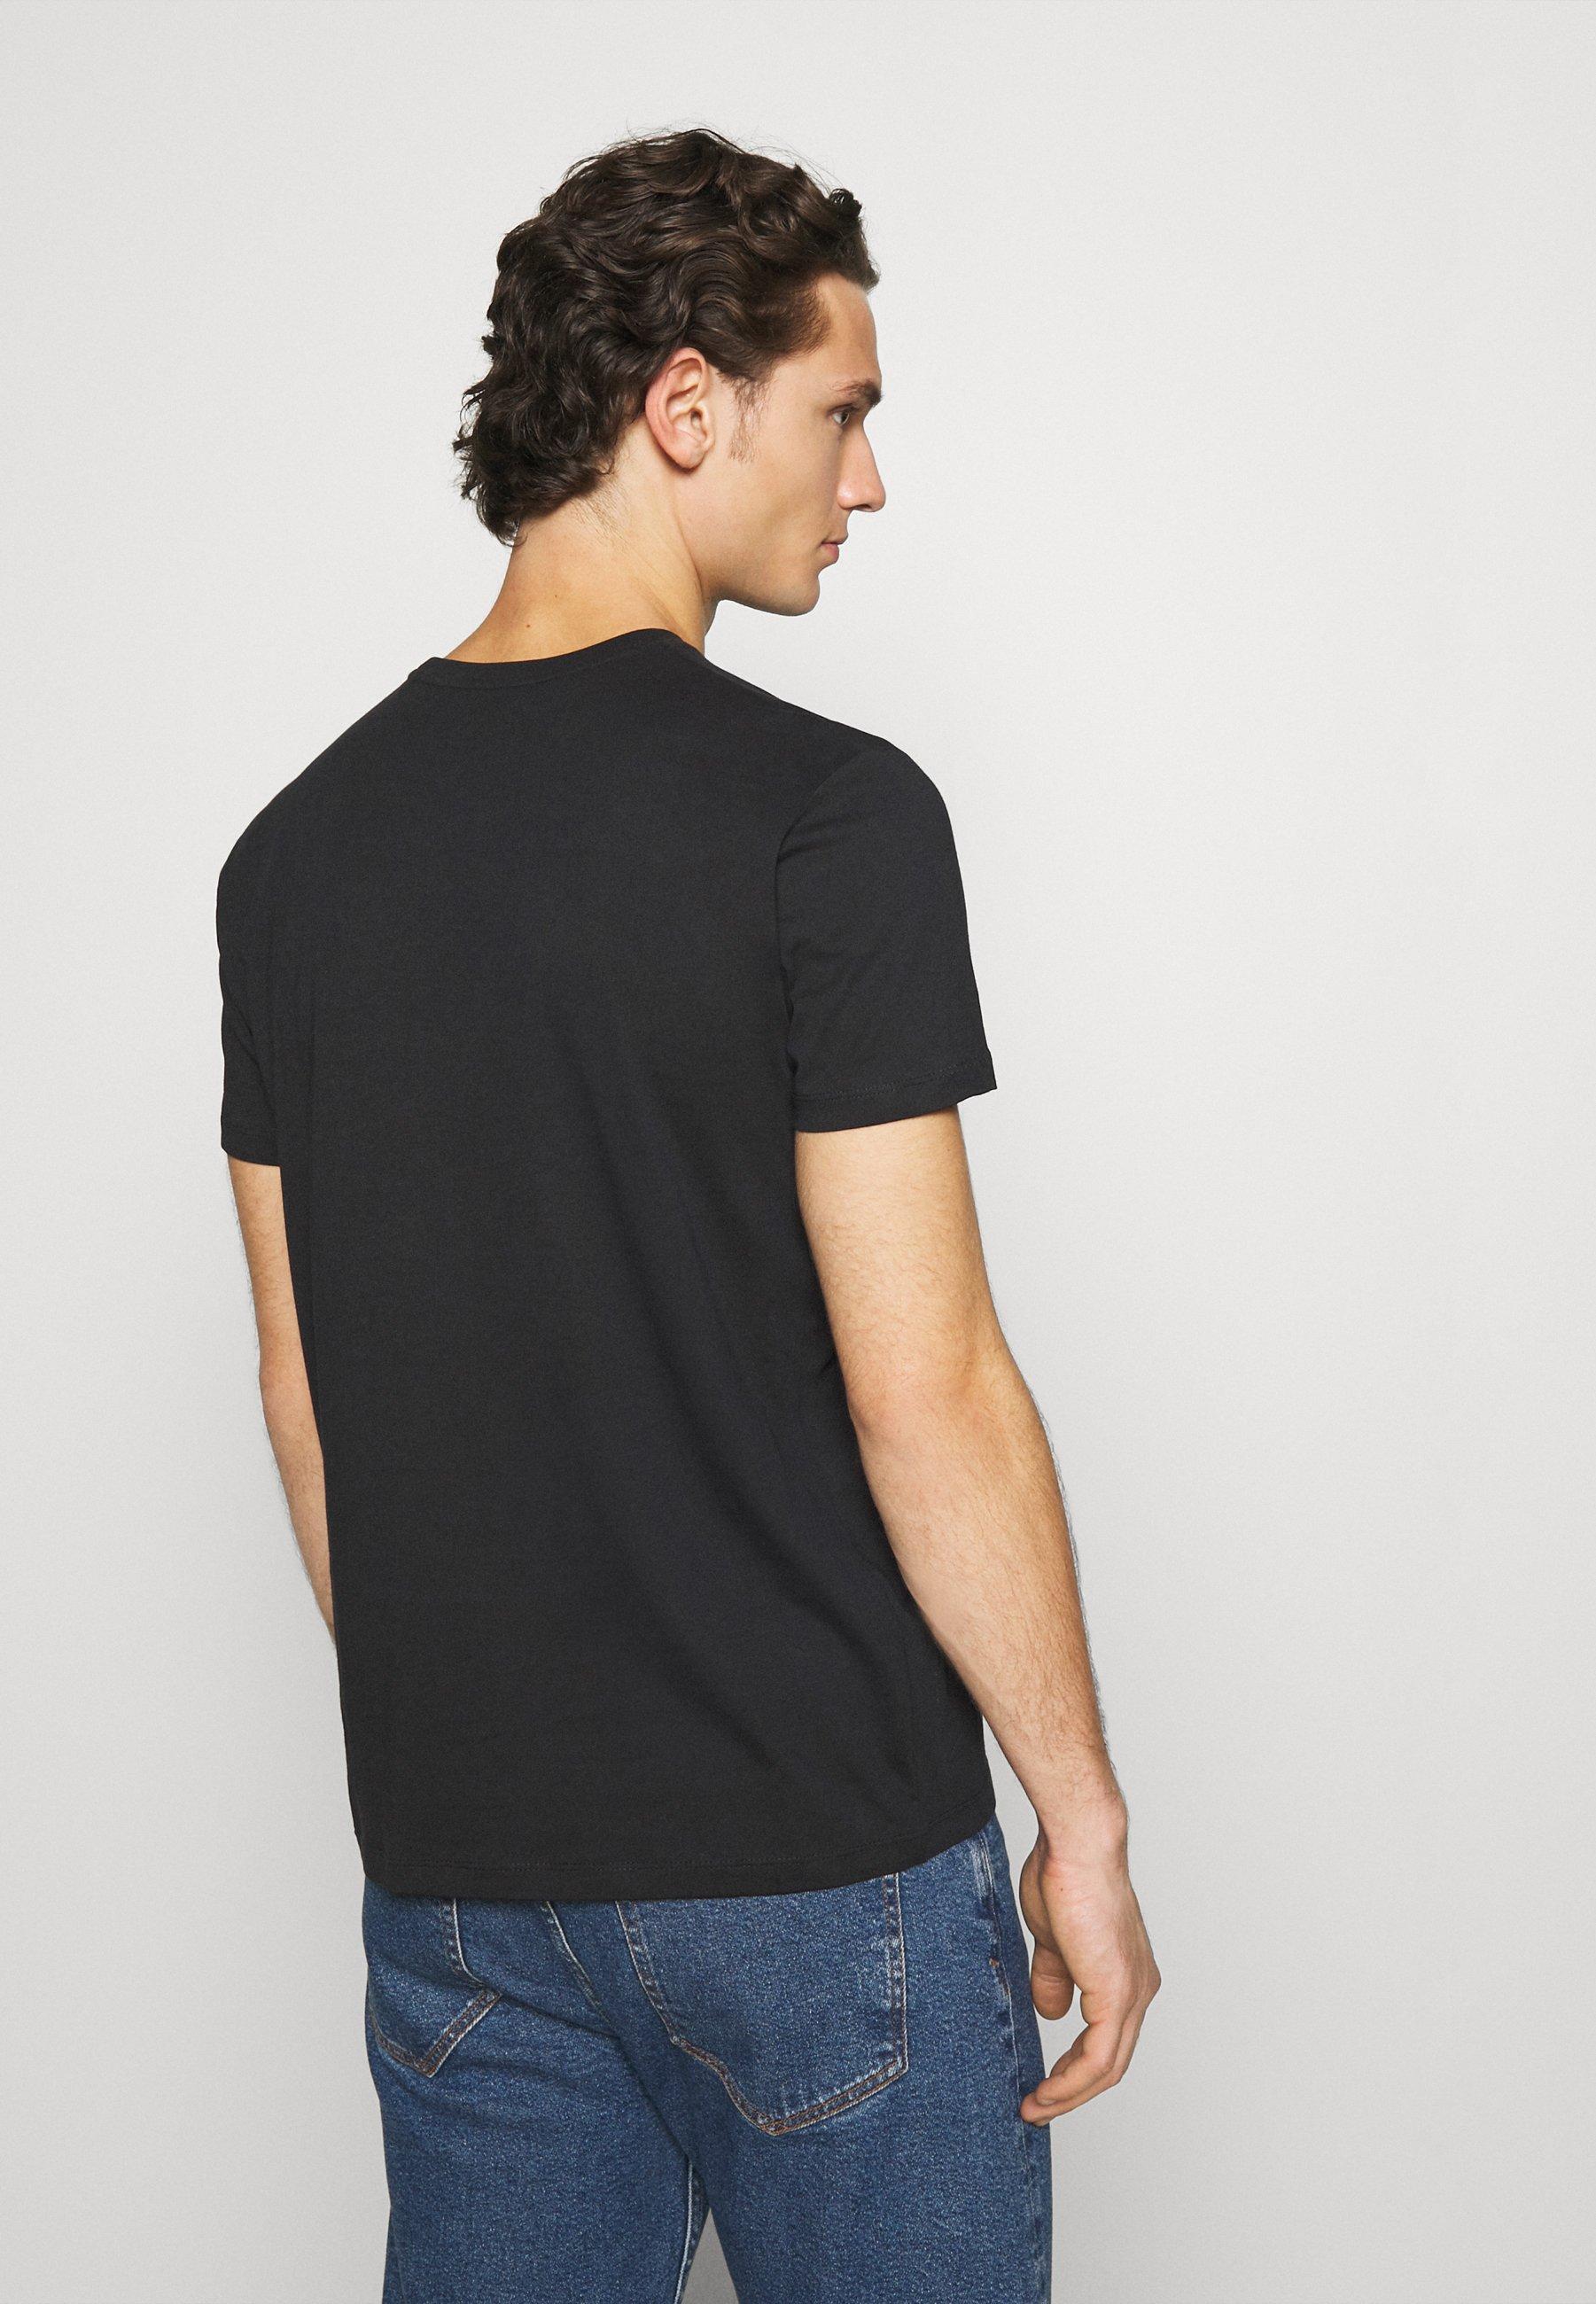 Esprit Print T-shirt - black YlBBK